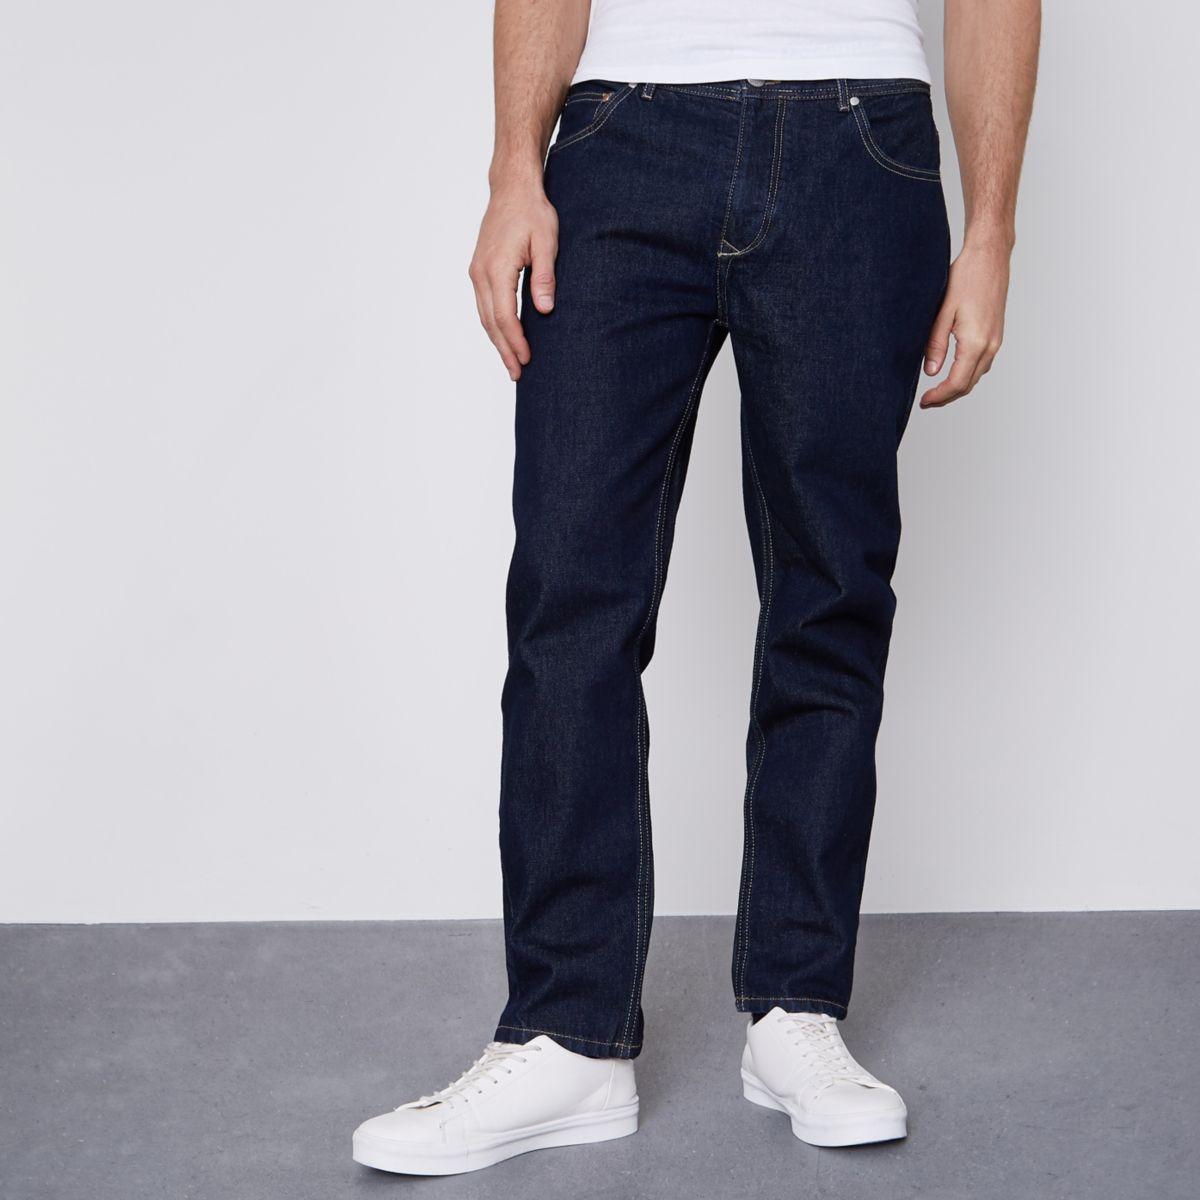 Dark blue tapered jeans